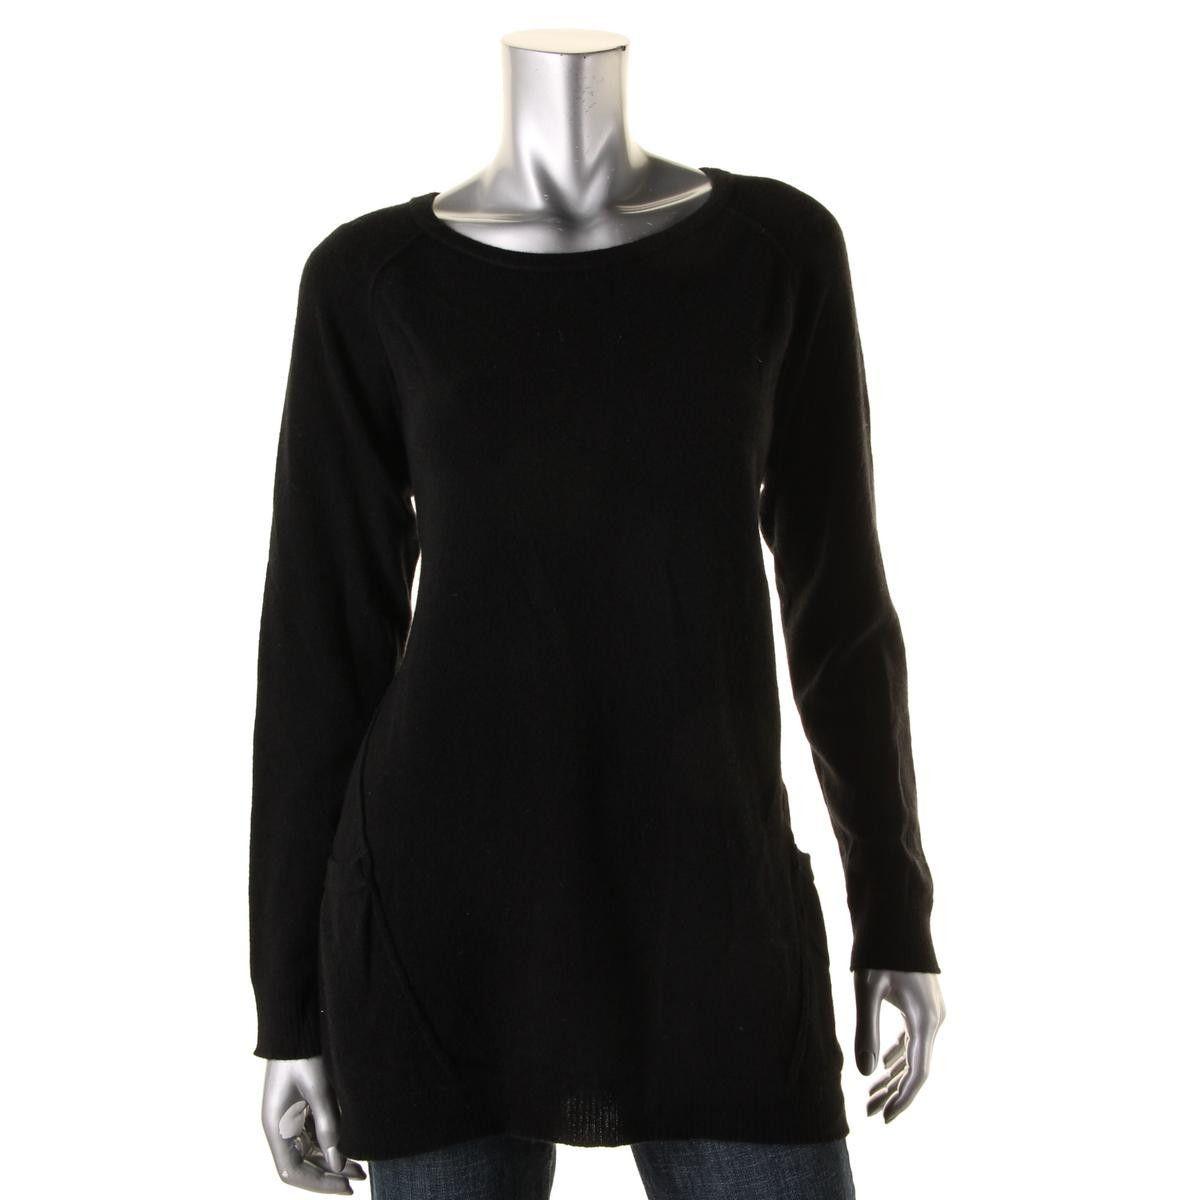 Aqua Cashmere Womens Cashmere Pockets Tunic Sweater | Products ...